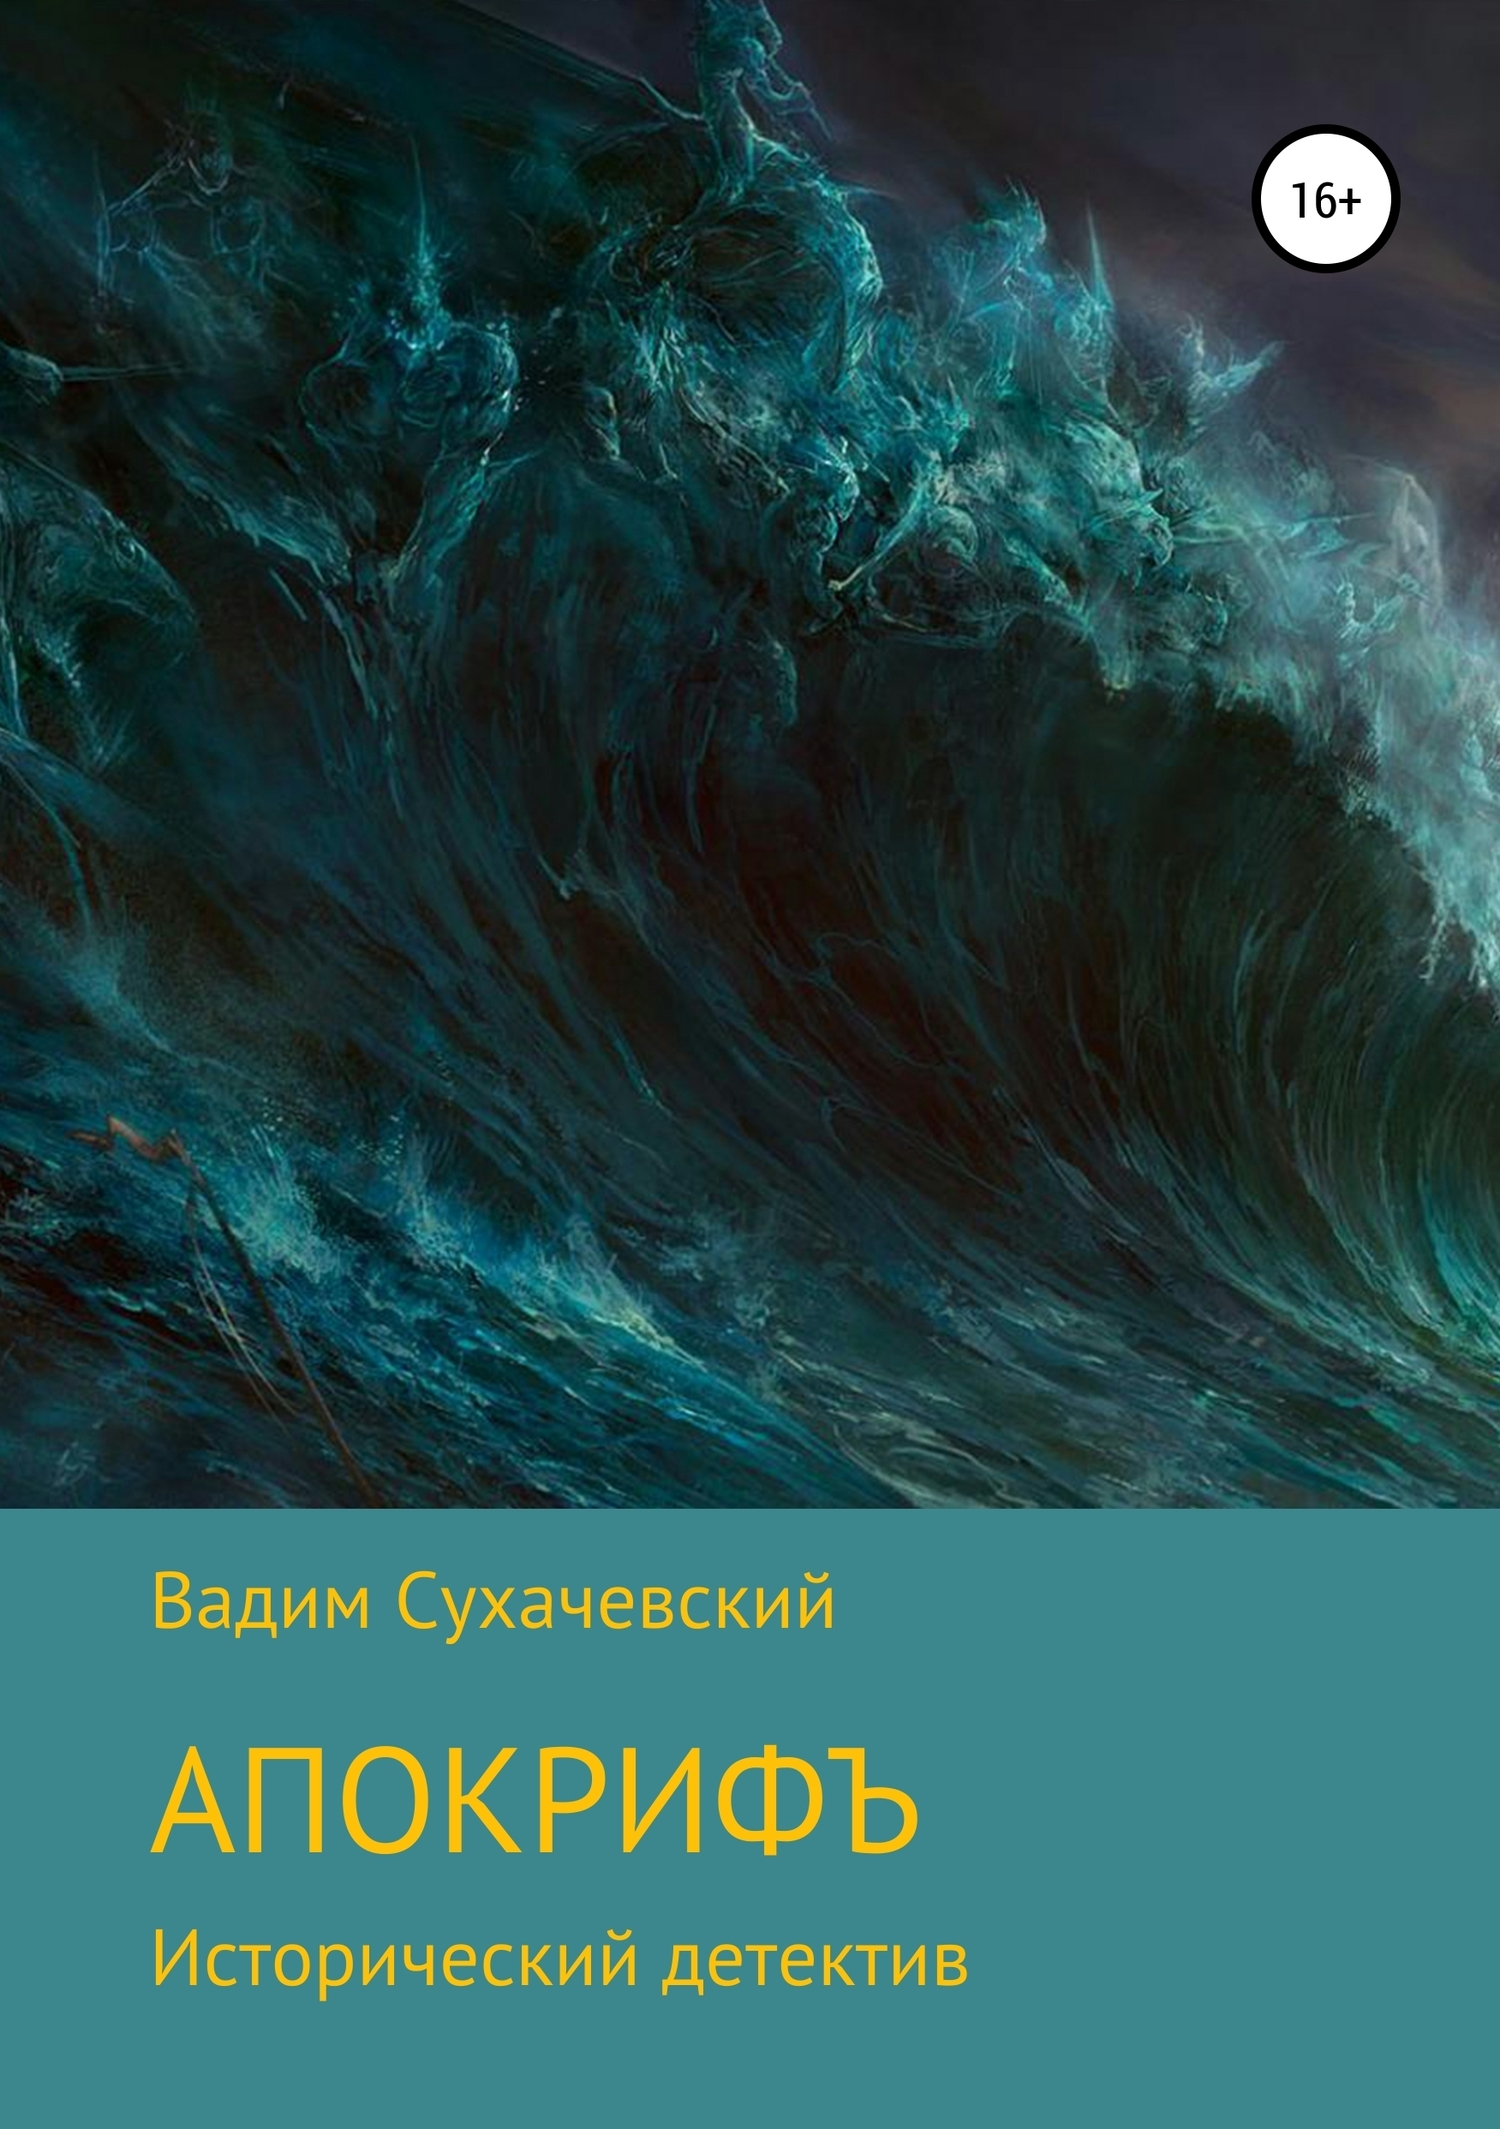 Вадим Сухачевский - Апокрифъ